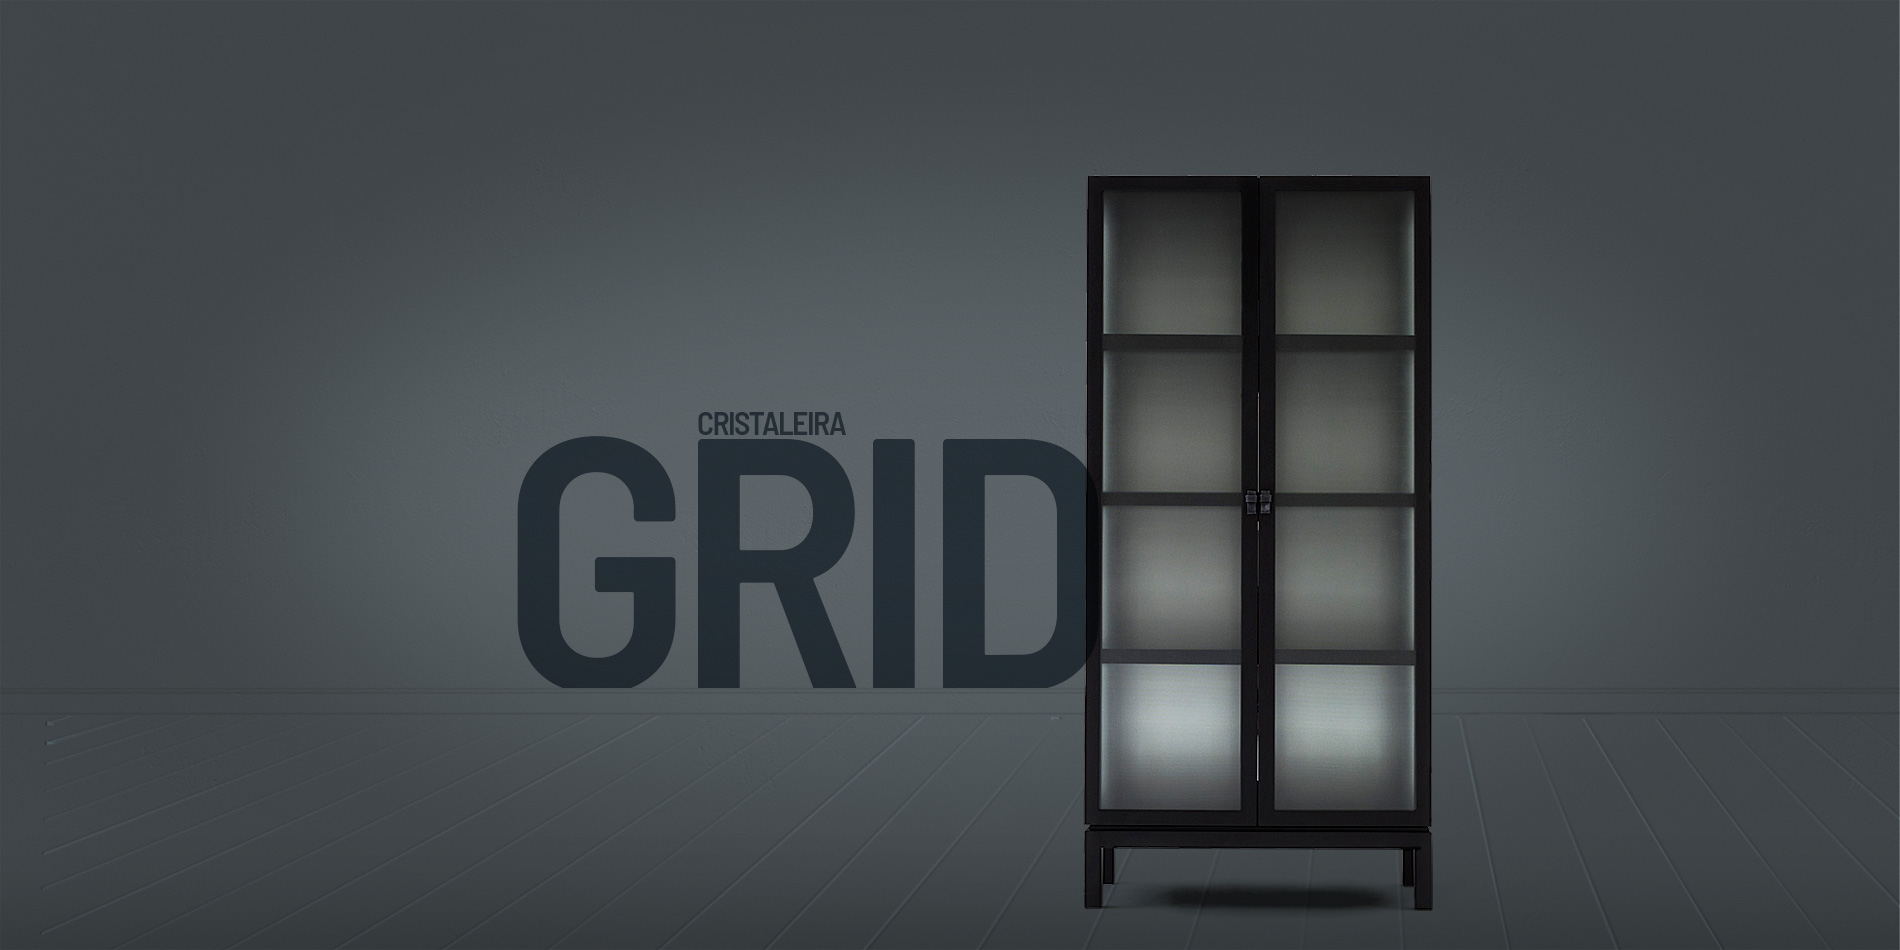 cristaleira grid